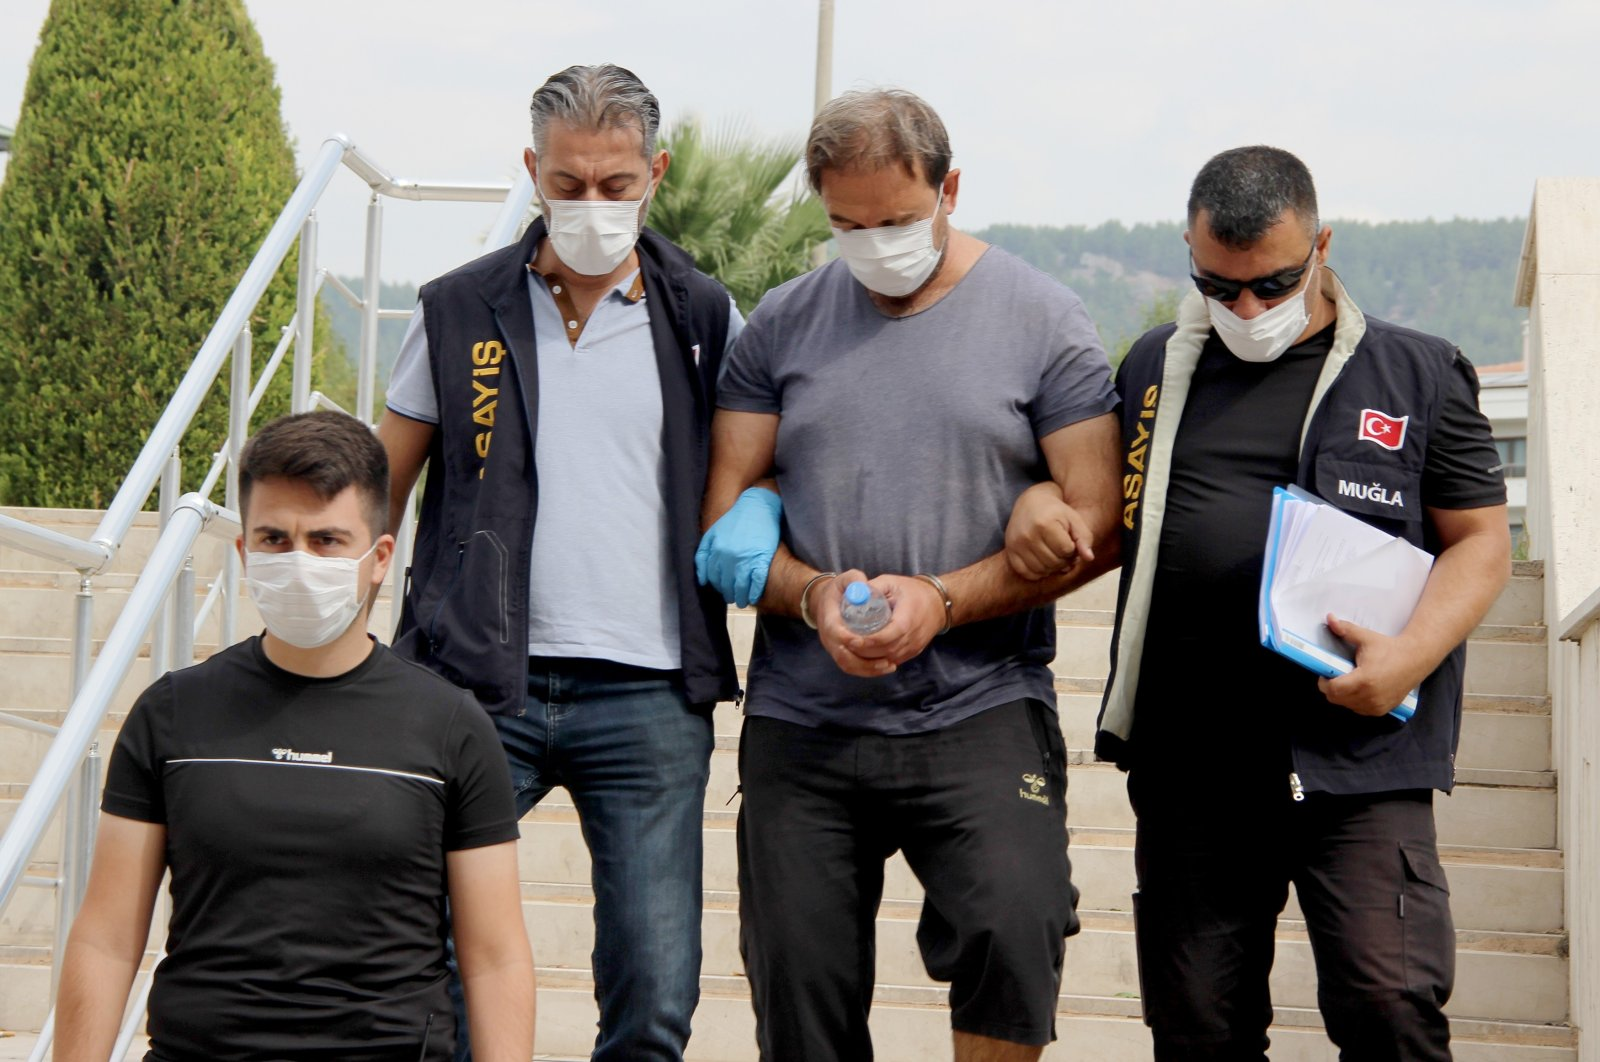 Police officers detainTayfun Demir, (C)in Muğla, Turkey, Sept. 20, 2020. (IHA Photo)